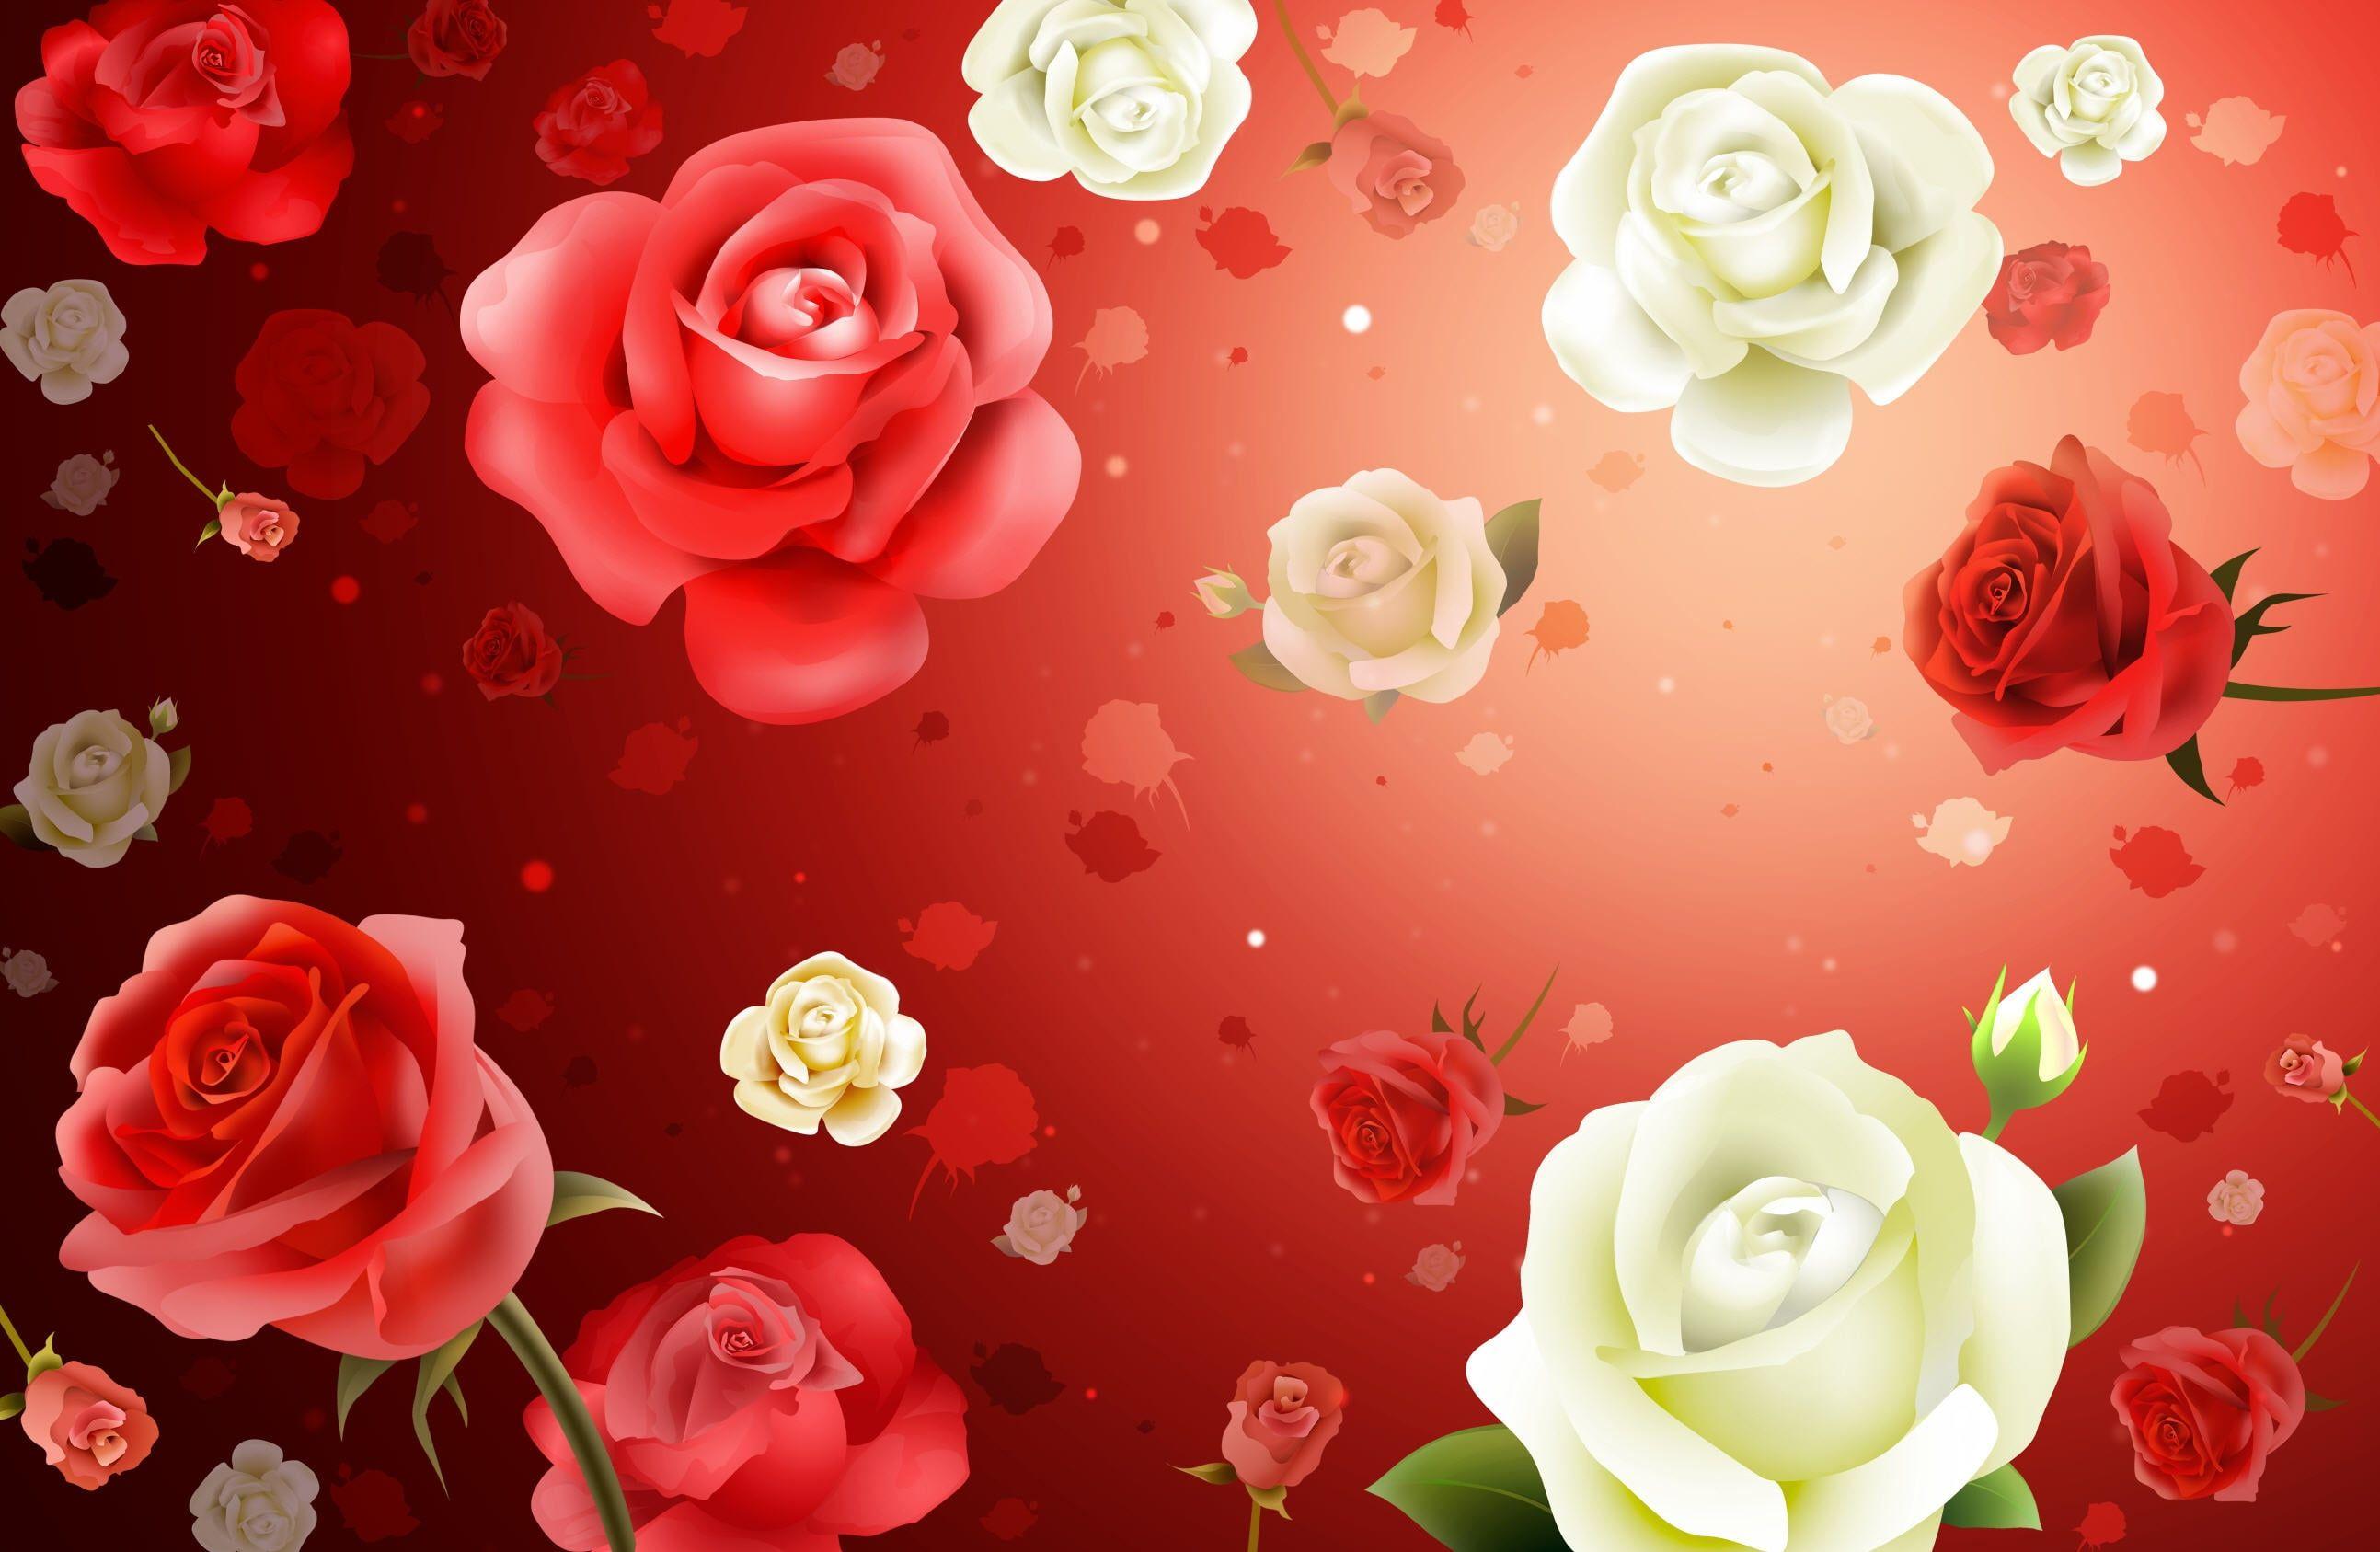 Red And White Roses Vector Art Flowers Roses Background Texture 2k Wallpaper Hdwallpaper Desktop Mawar Cantik Wallpaper Bunga Mawar Ungu